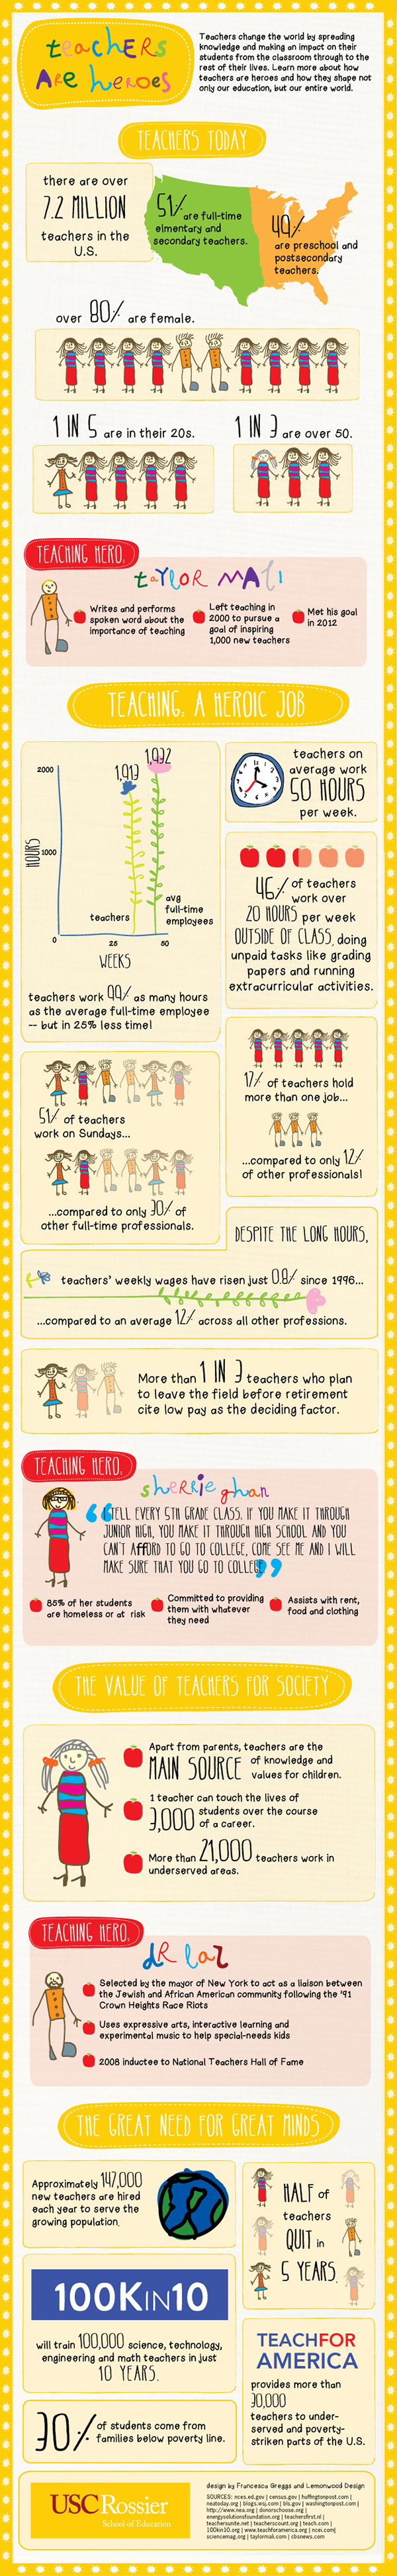 Teacher Appreciation Facts and Statistics